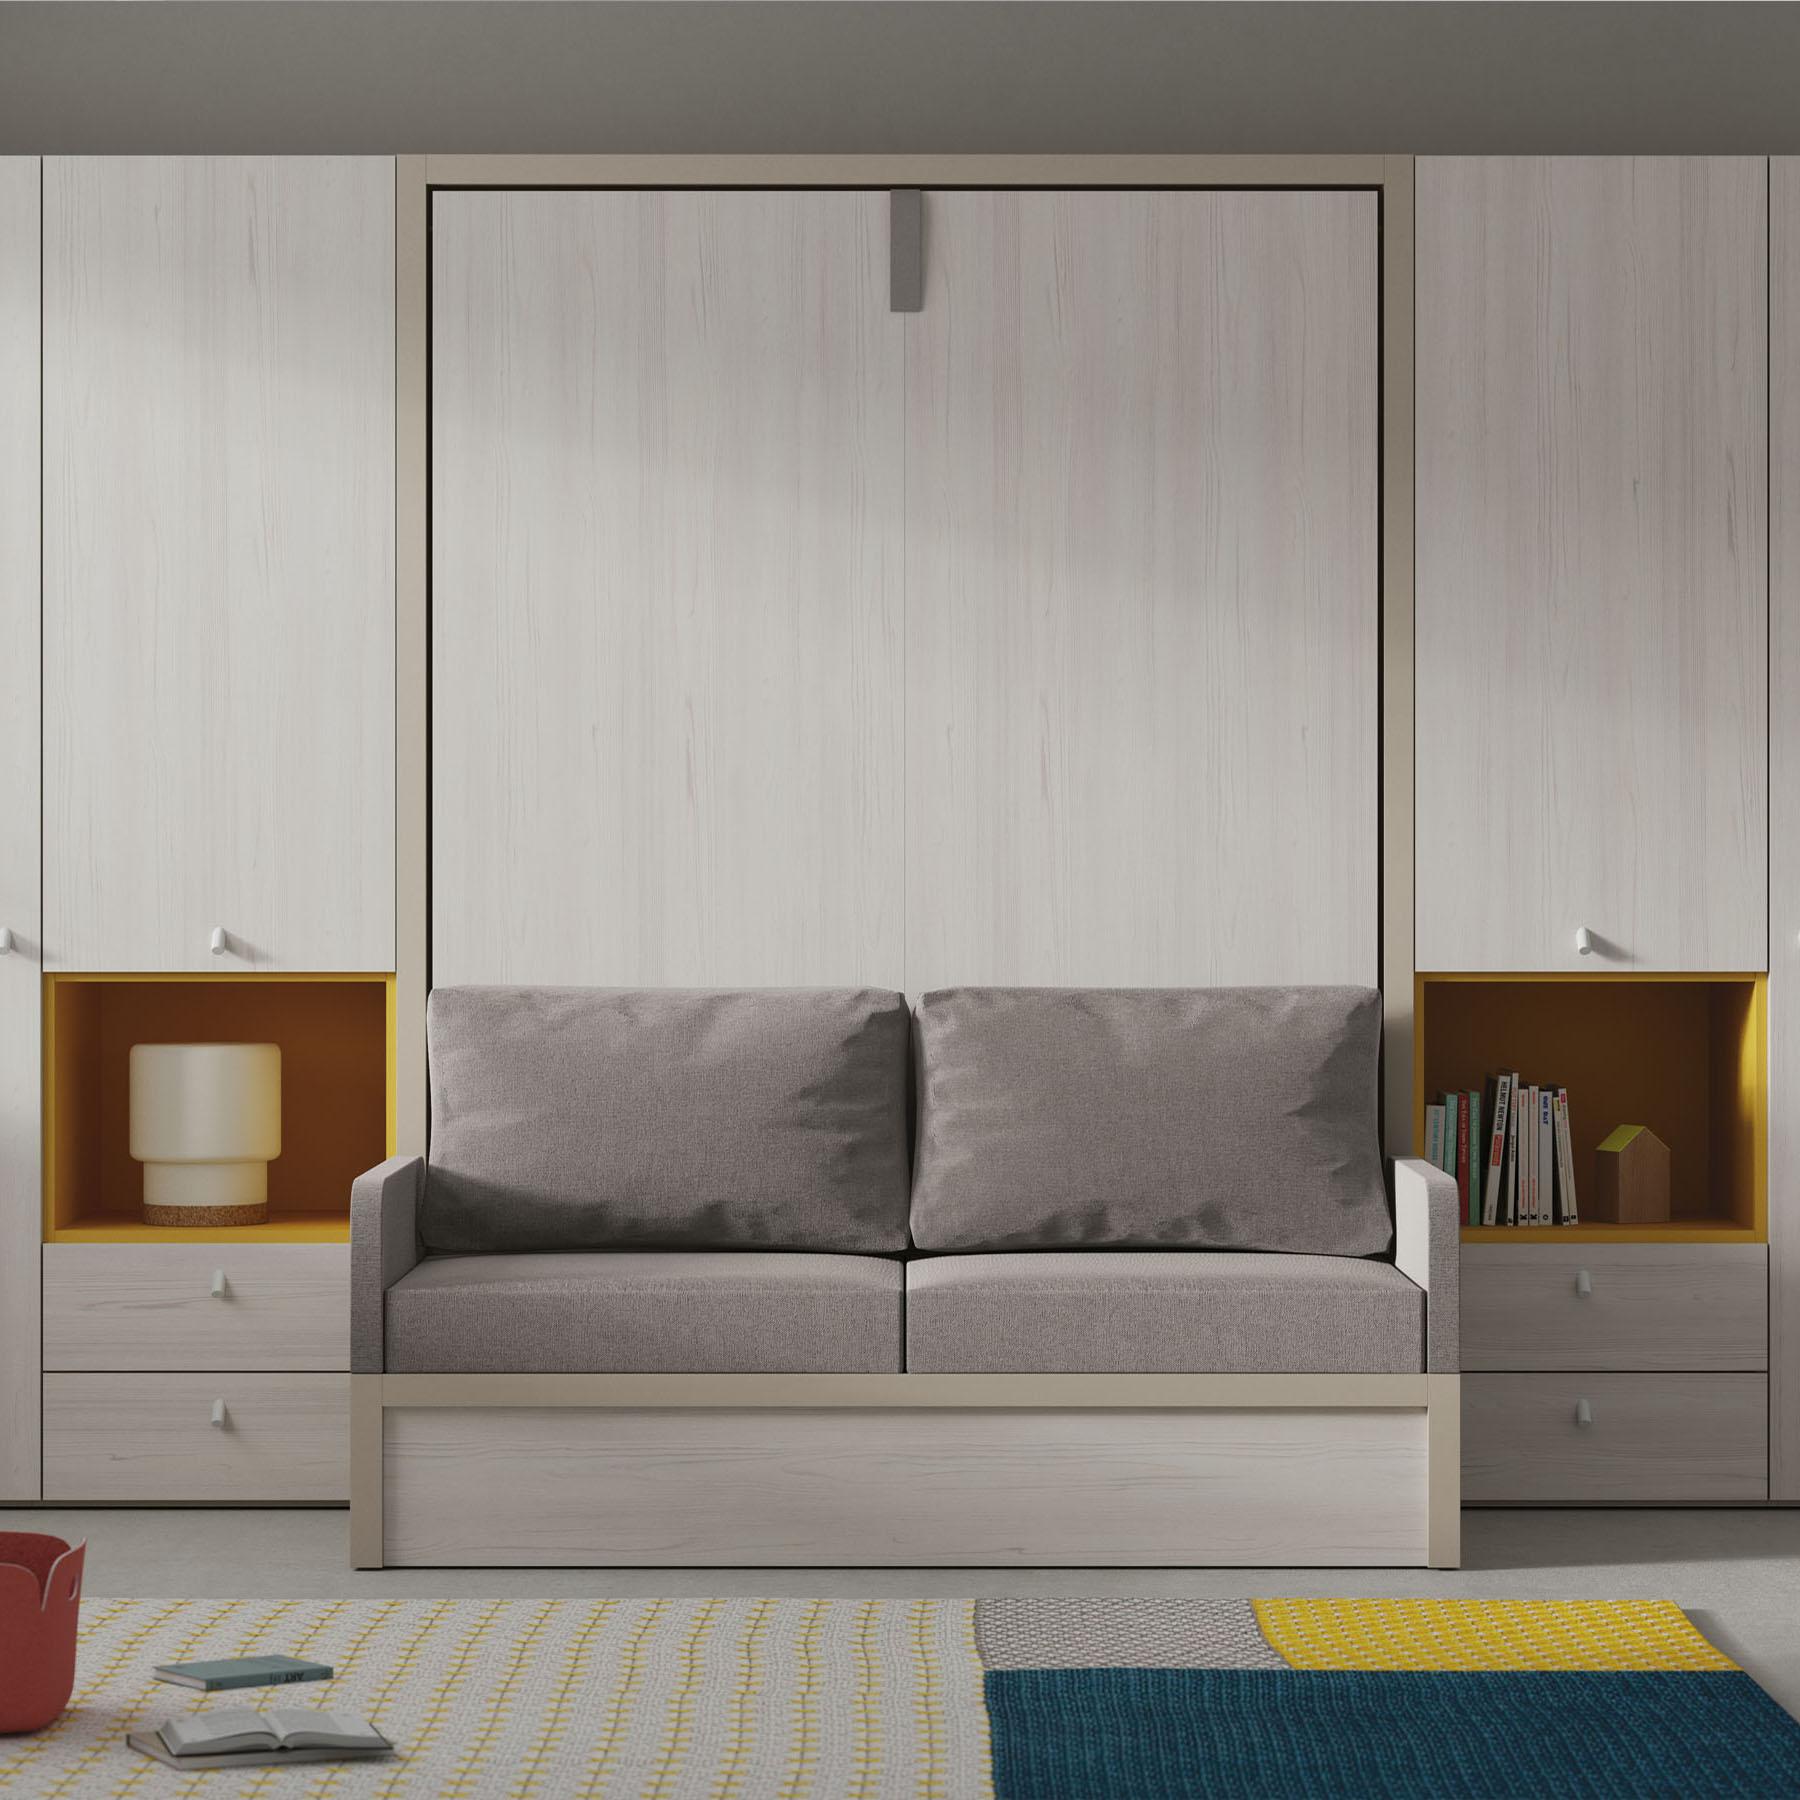 Habitaci n juvenil cama abatible 6 mbit - Habitacion juvenil cama abatible ...